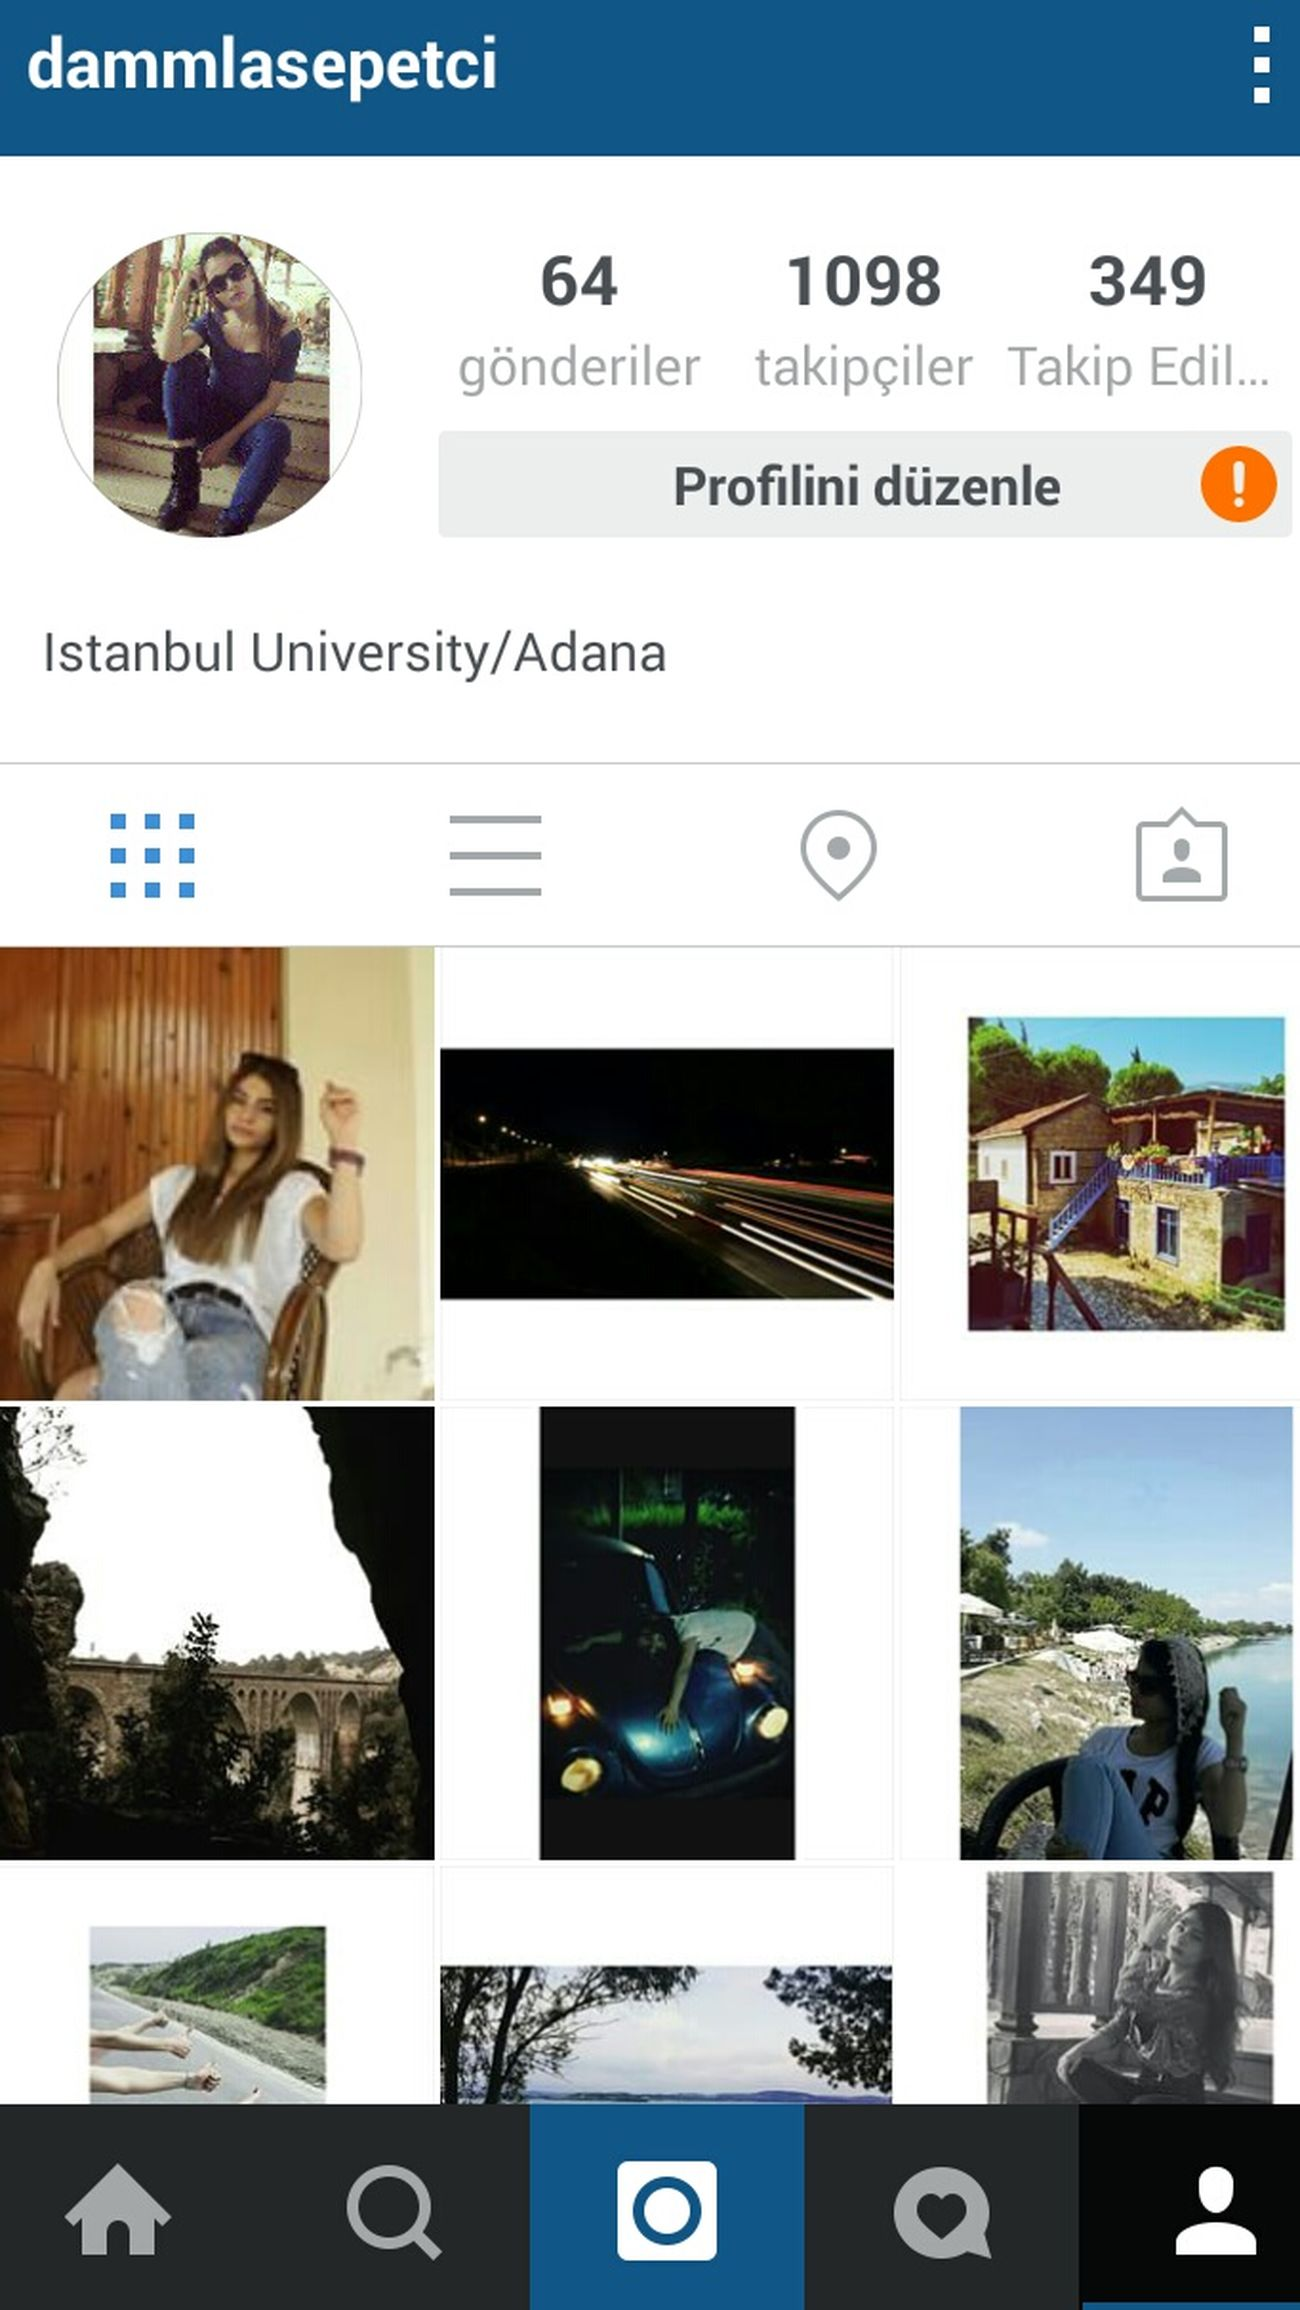 ınstagram >> dammlasepetci Instagood Instagramer Instagramturkey Instagramsg Instag_app Snapchat Snapchat Me Instagramtagsdotcom